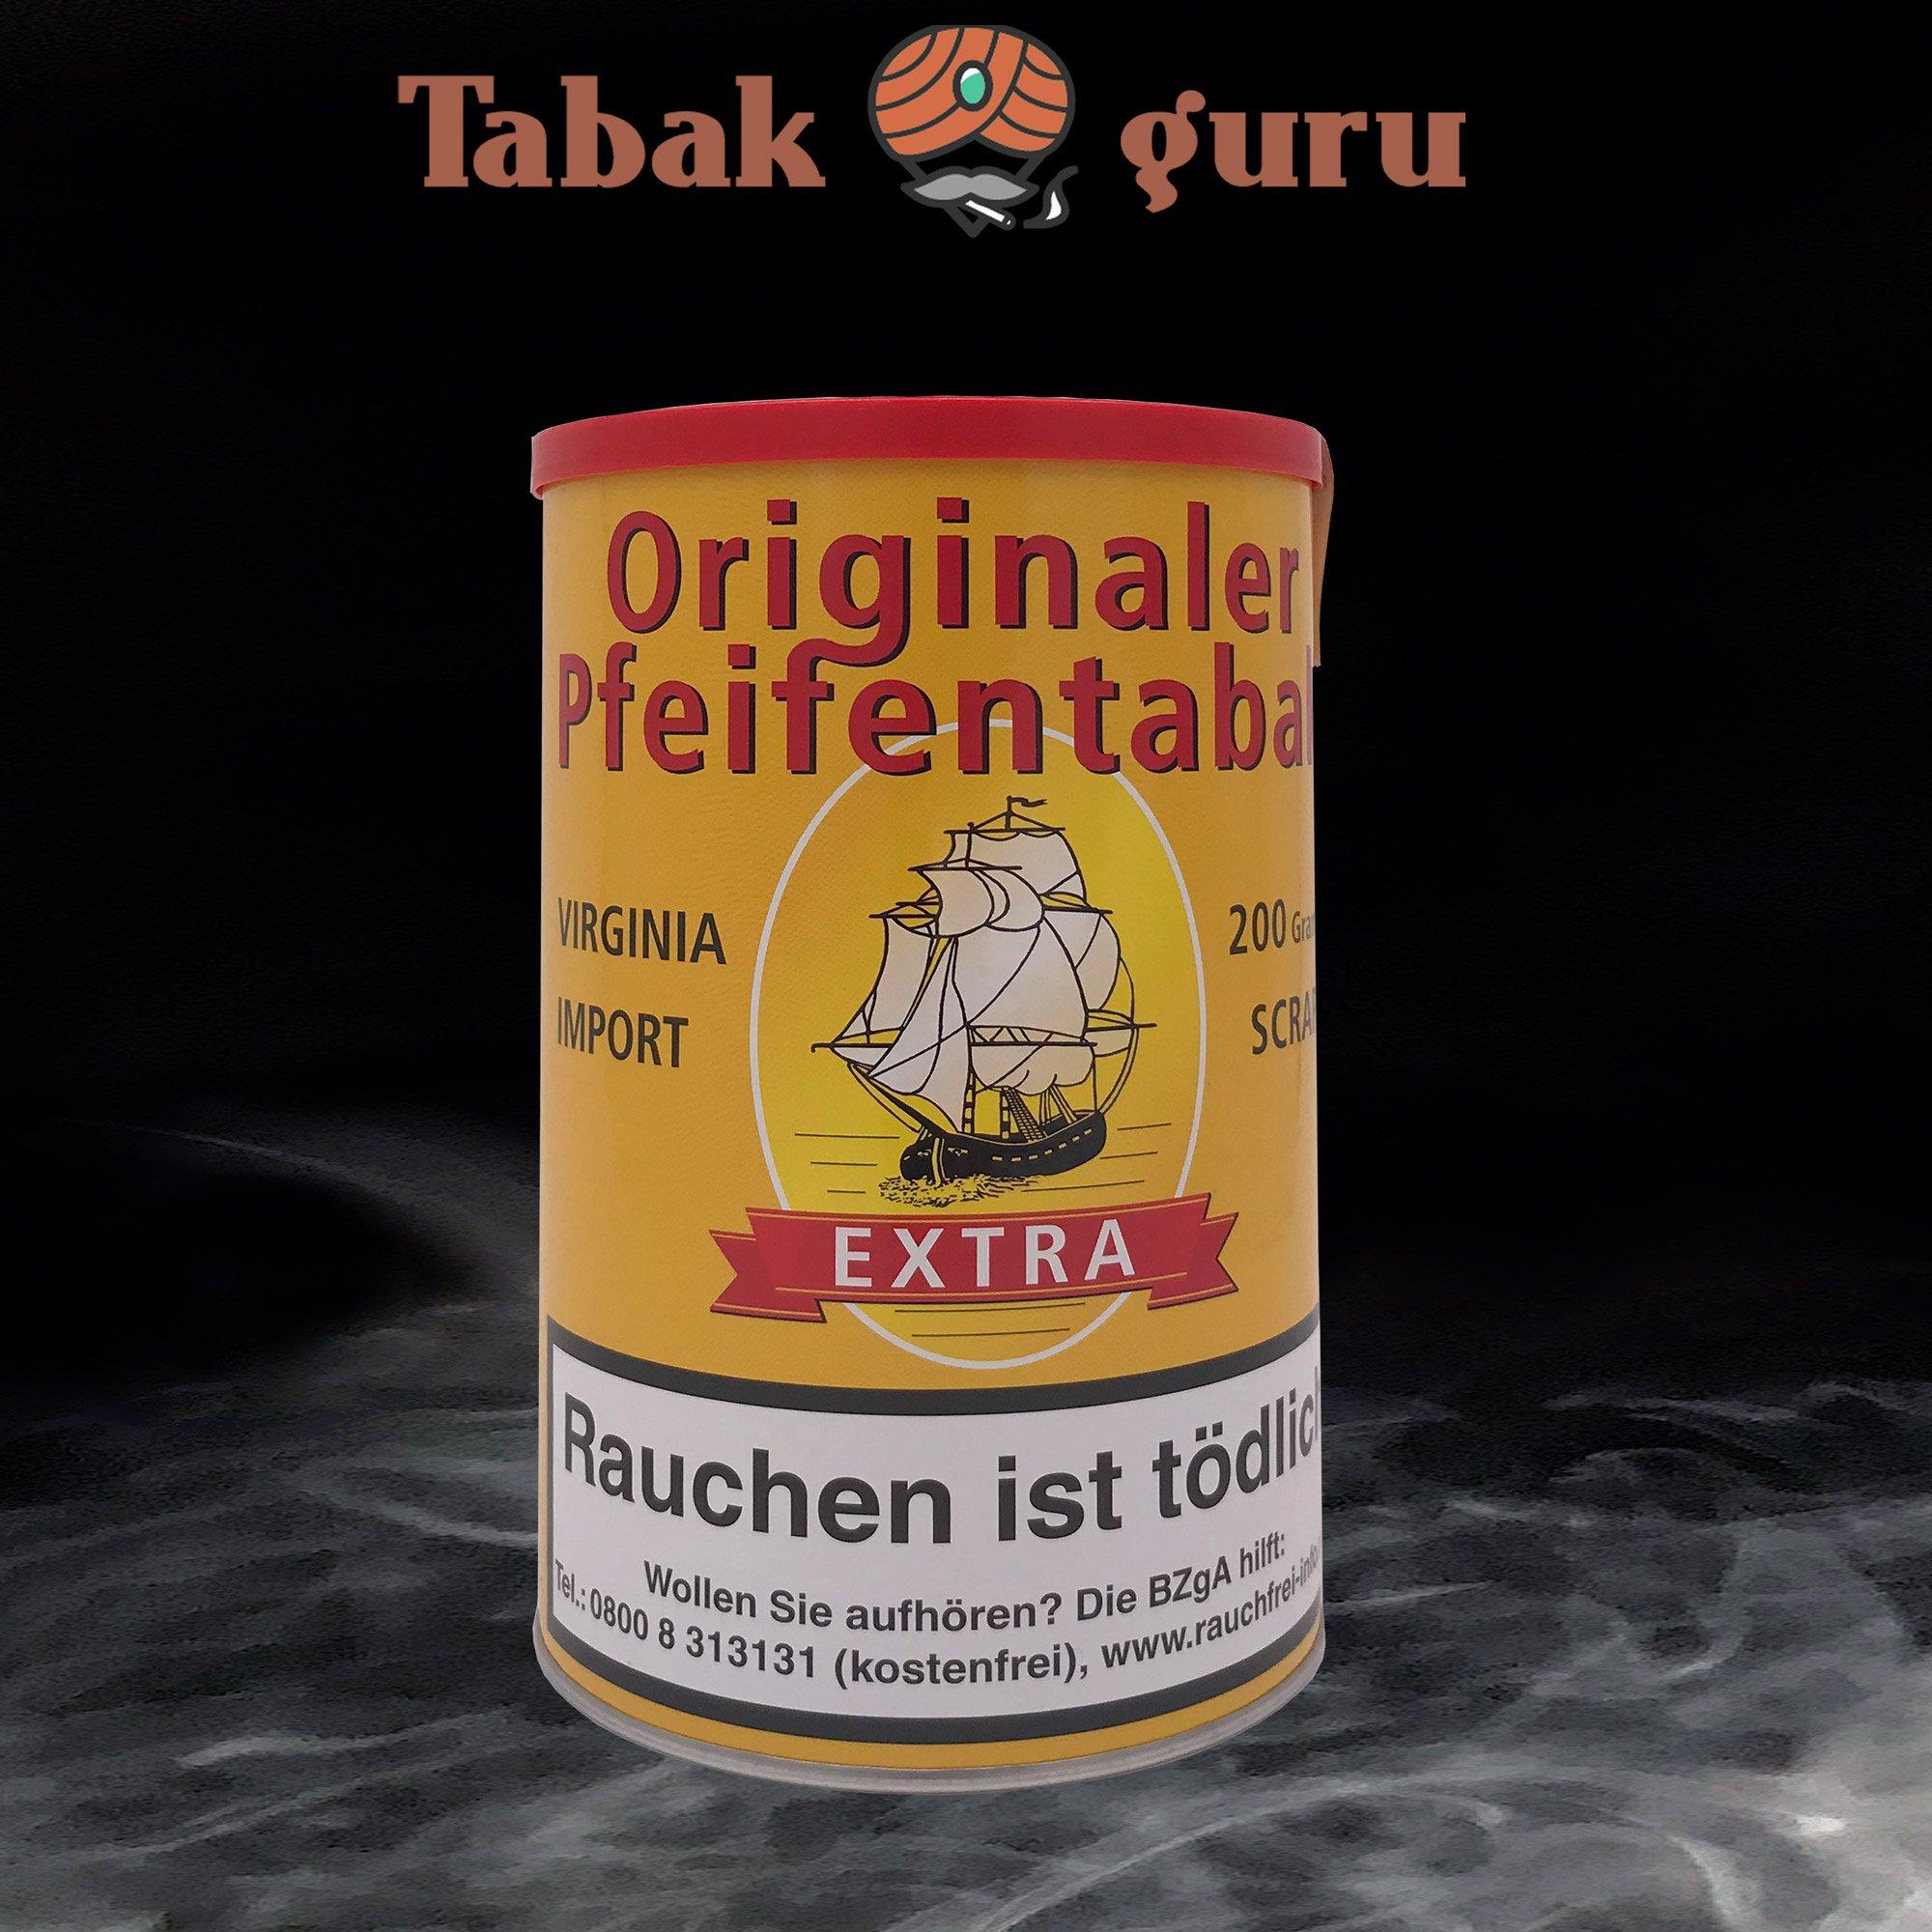 Originaler Pfeifentabak Extra Inhalt 200g